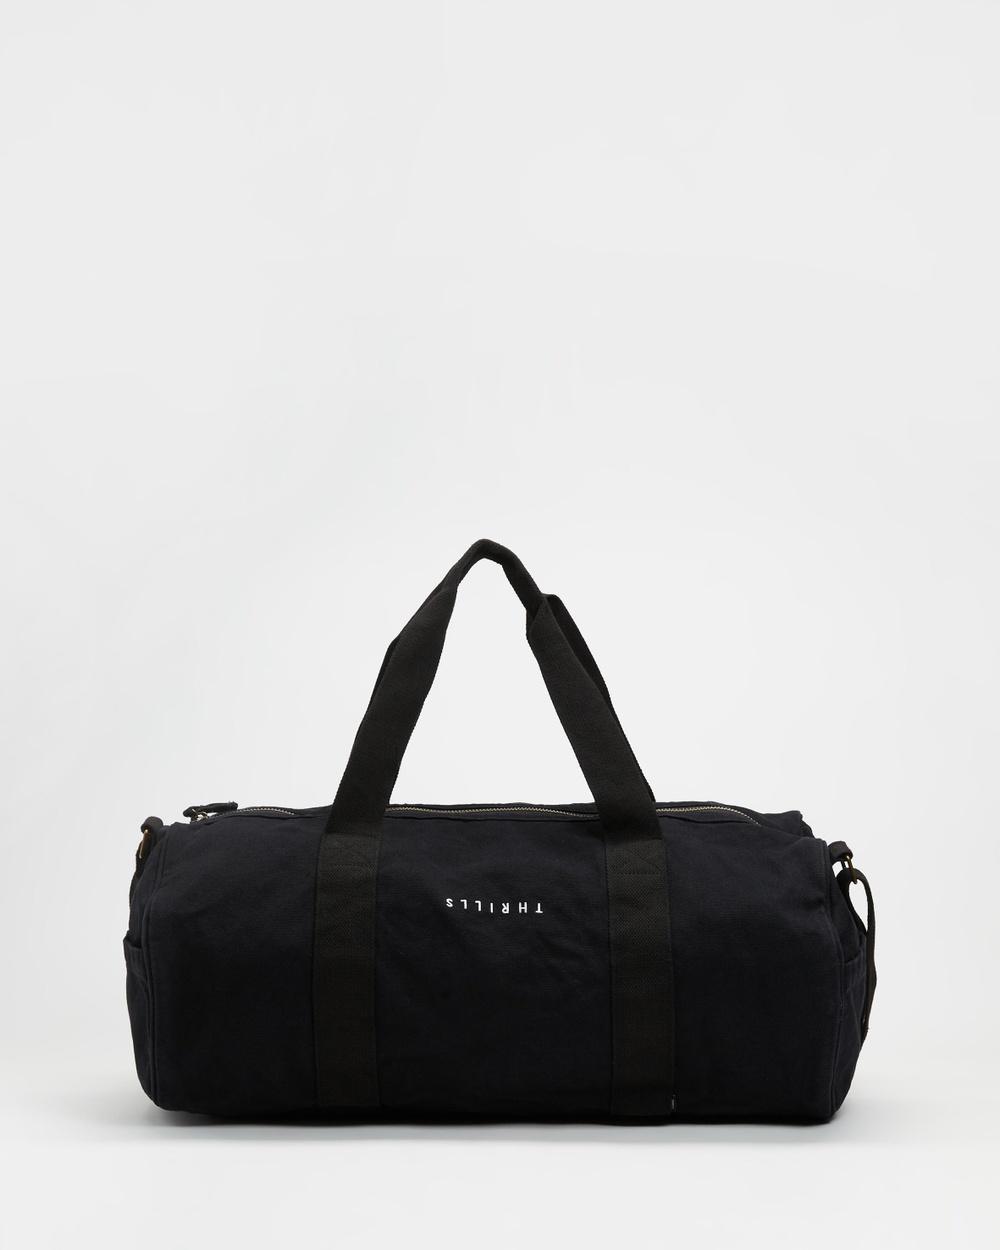 Thrills Minimal Road Duffle Bags Black